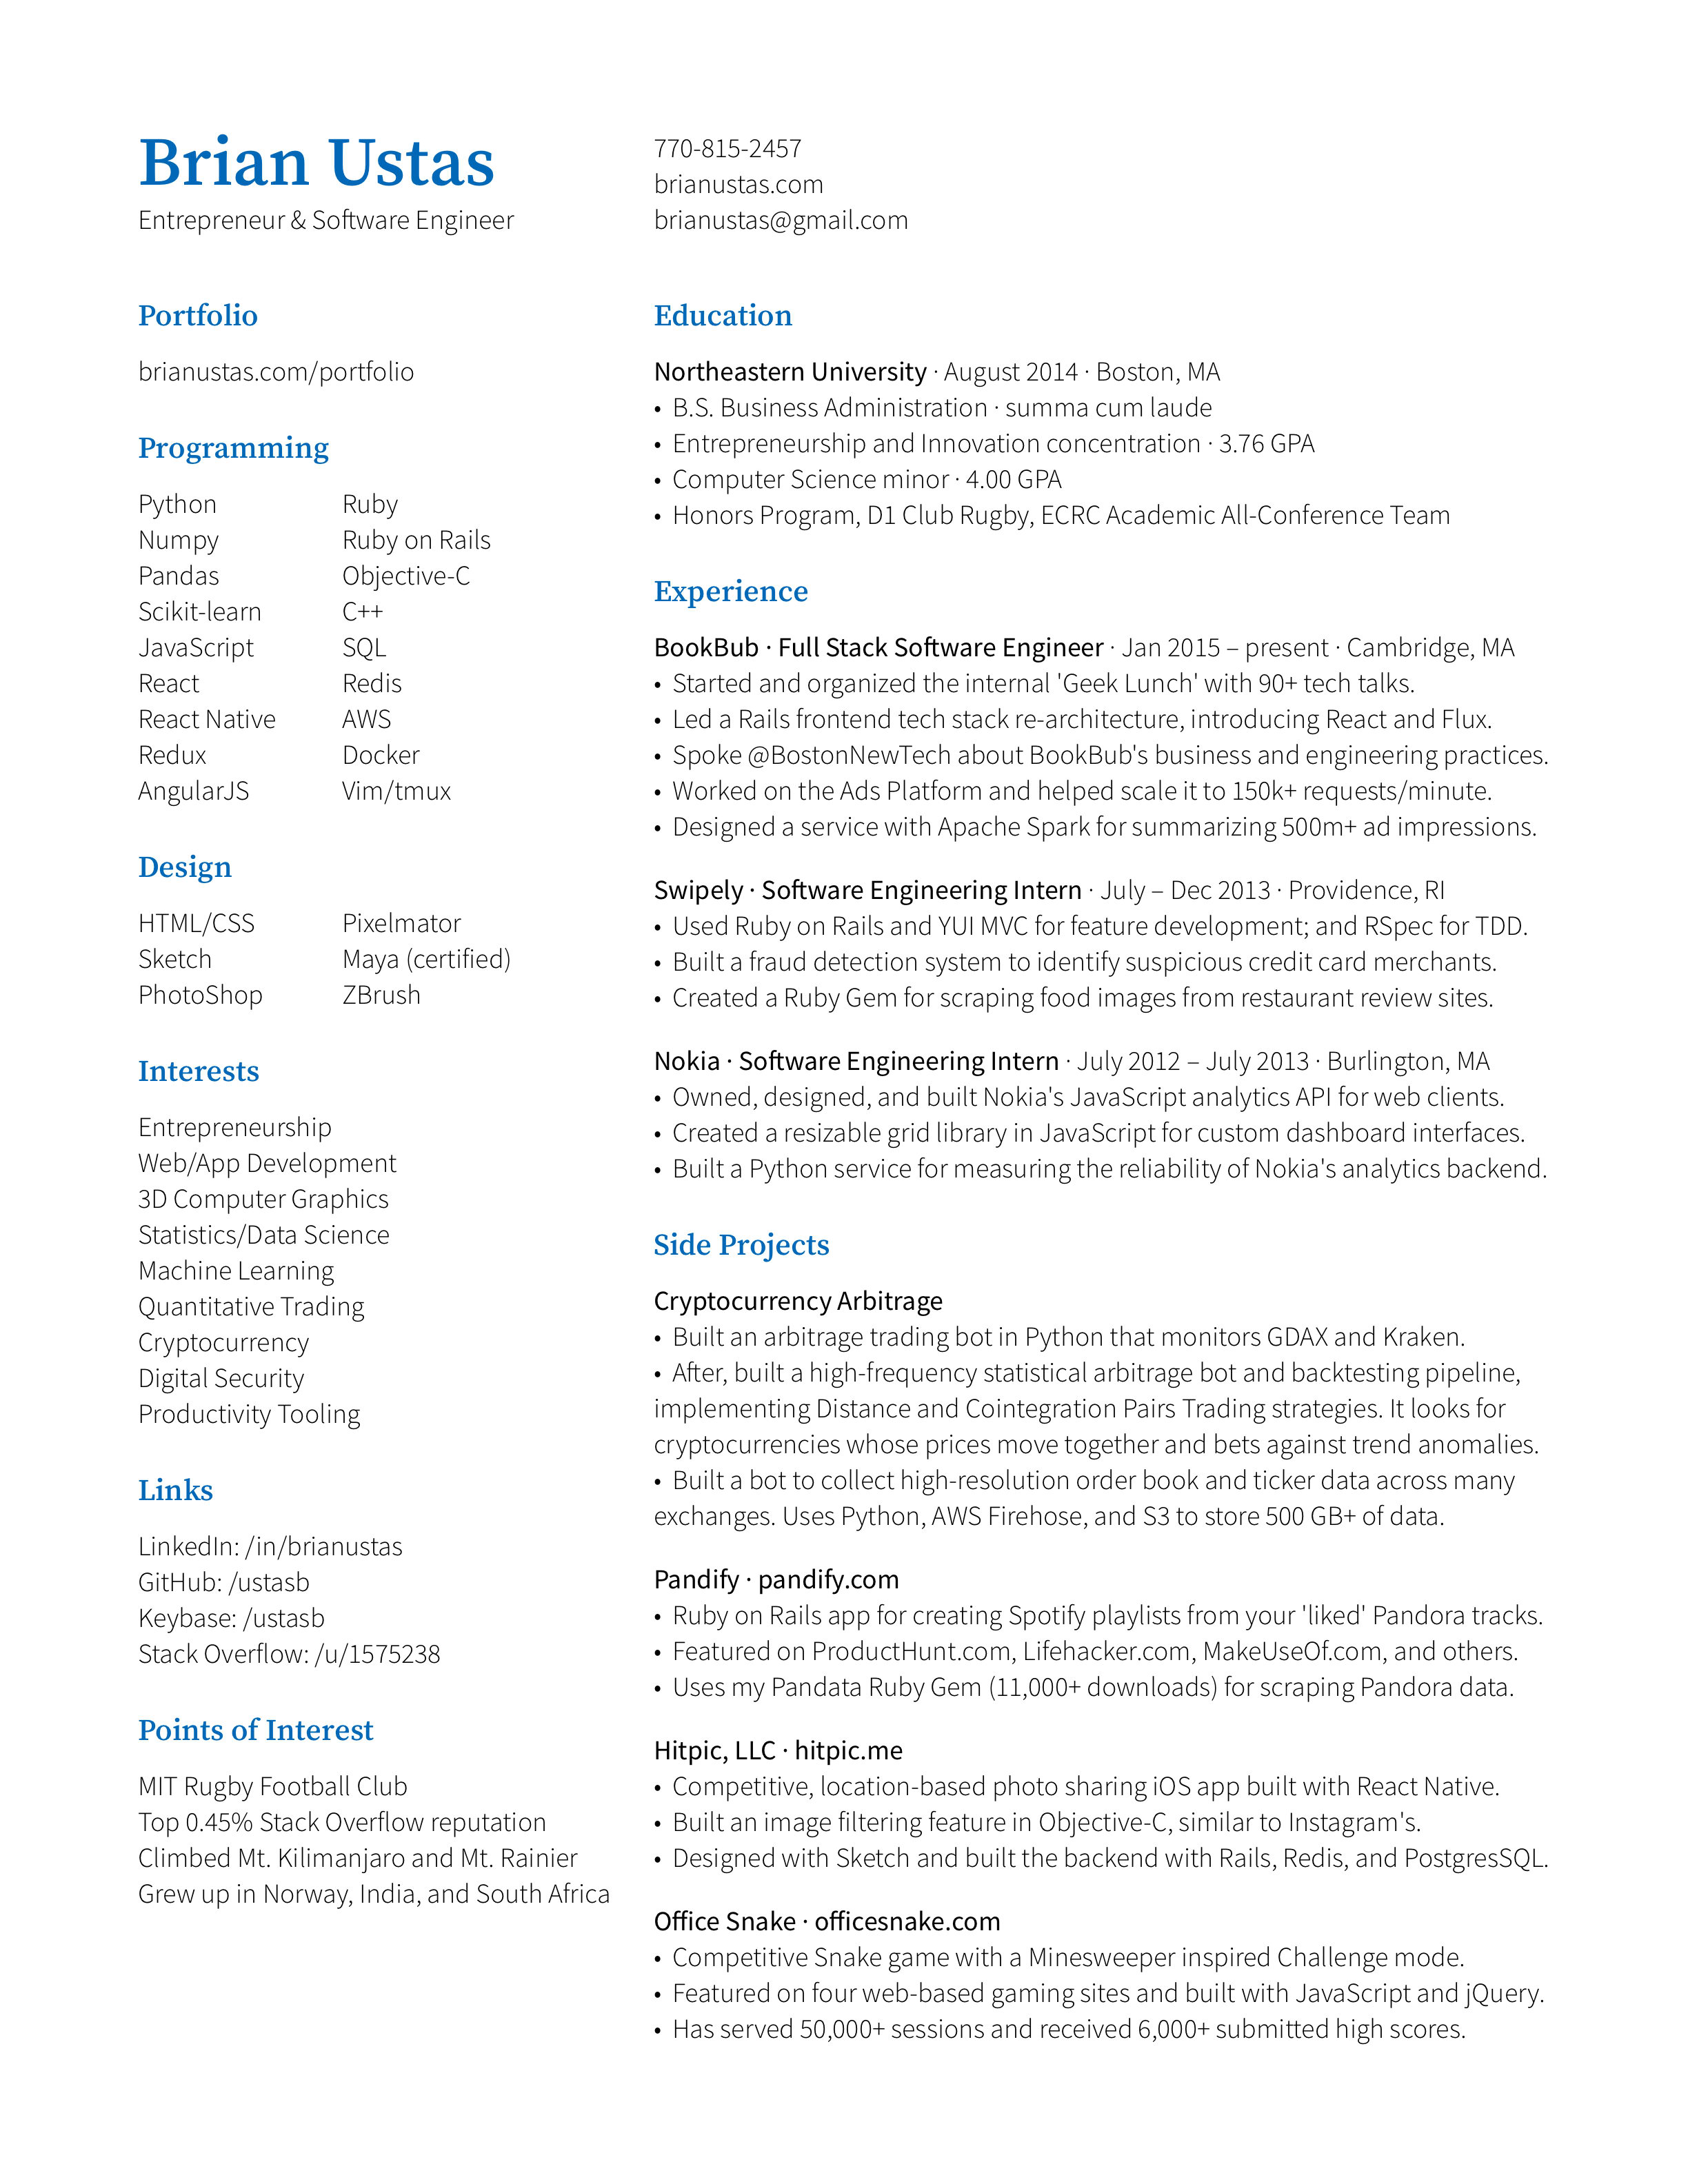 Brian Ustas's resume